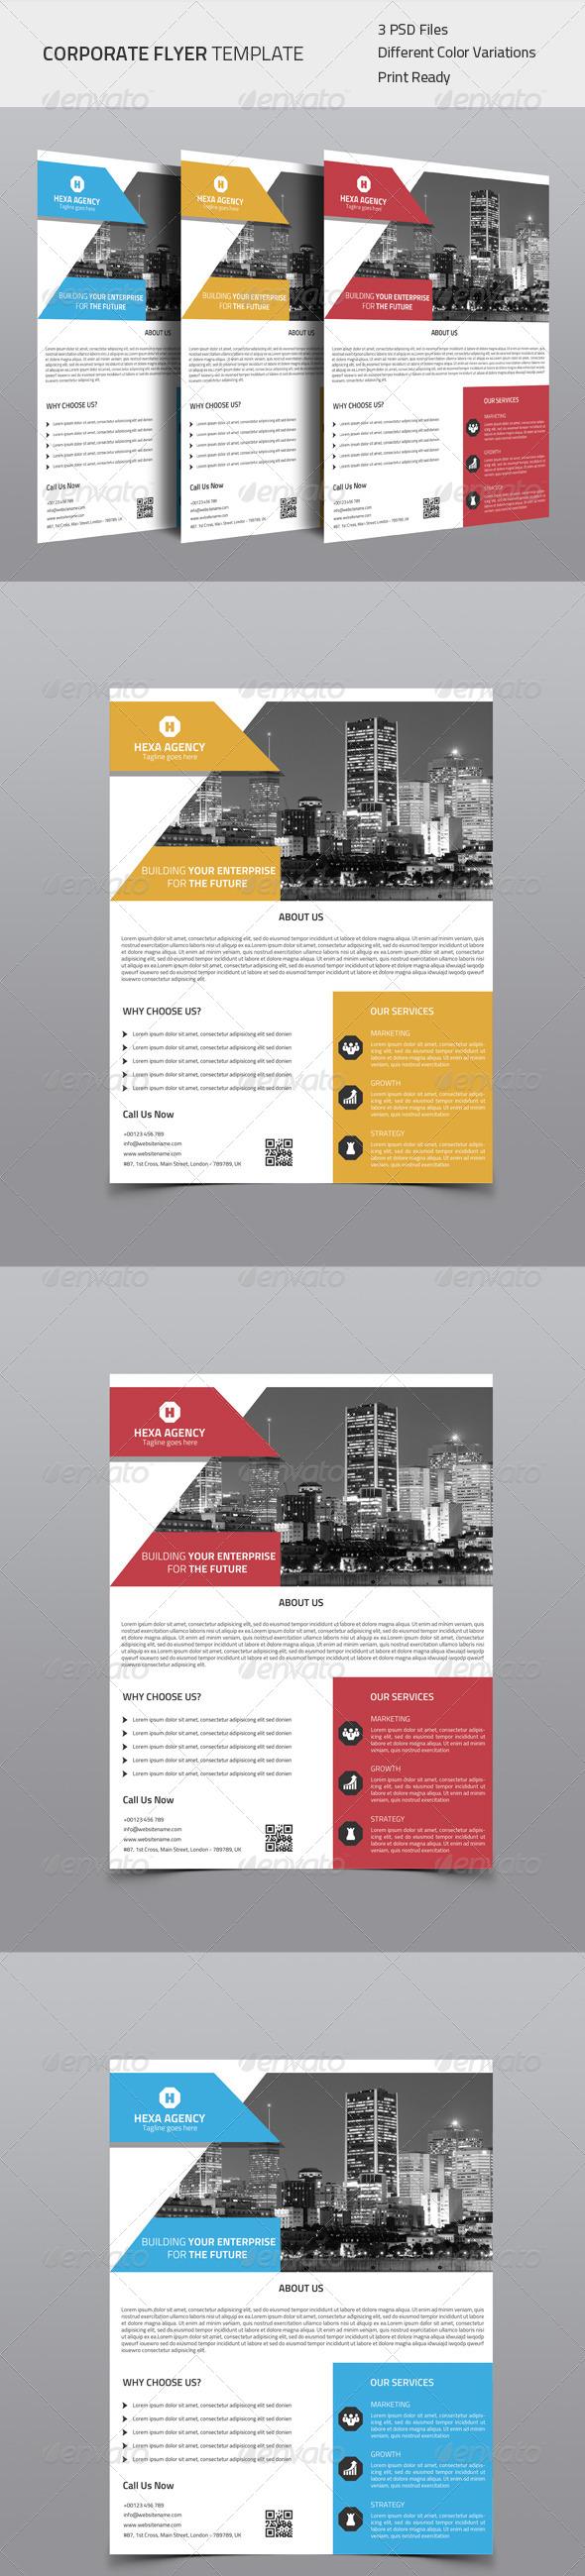 GraphicRiver Corporate Flyer 04 8675760